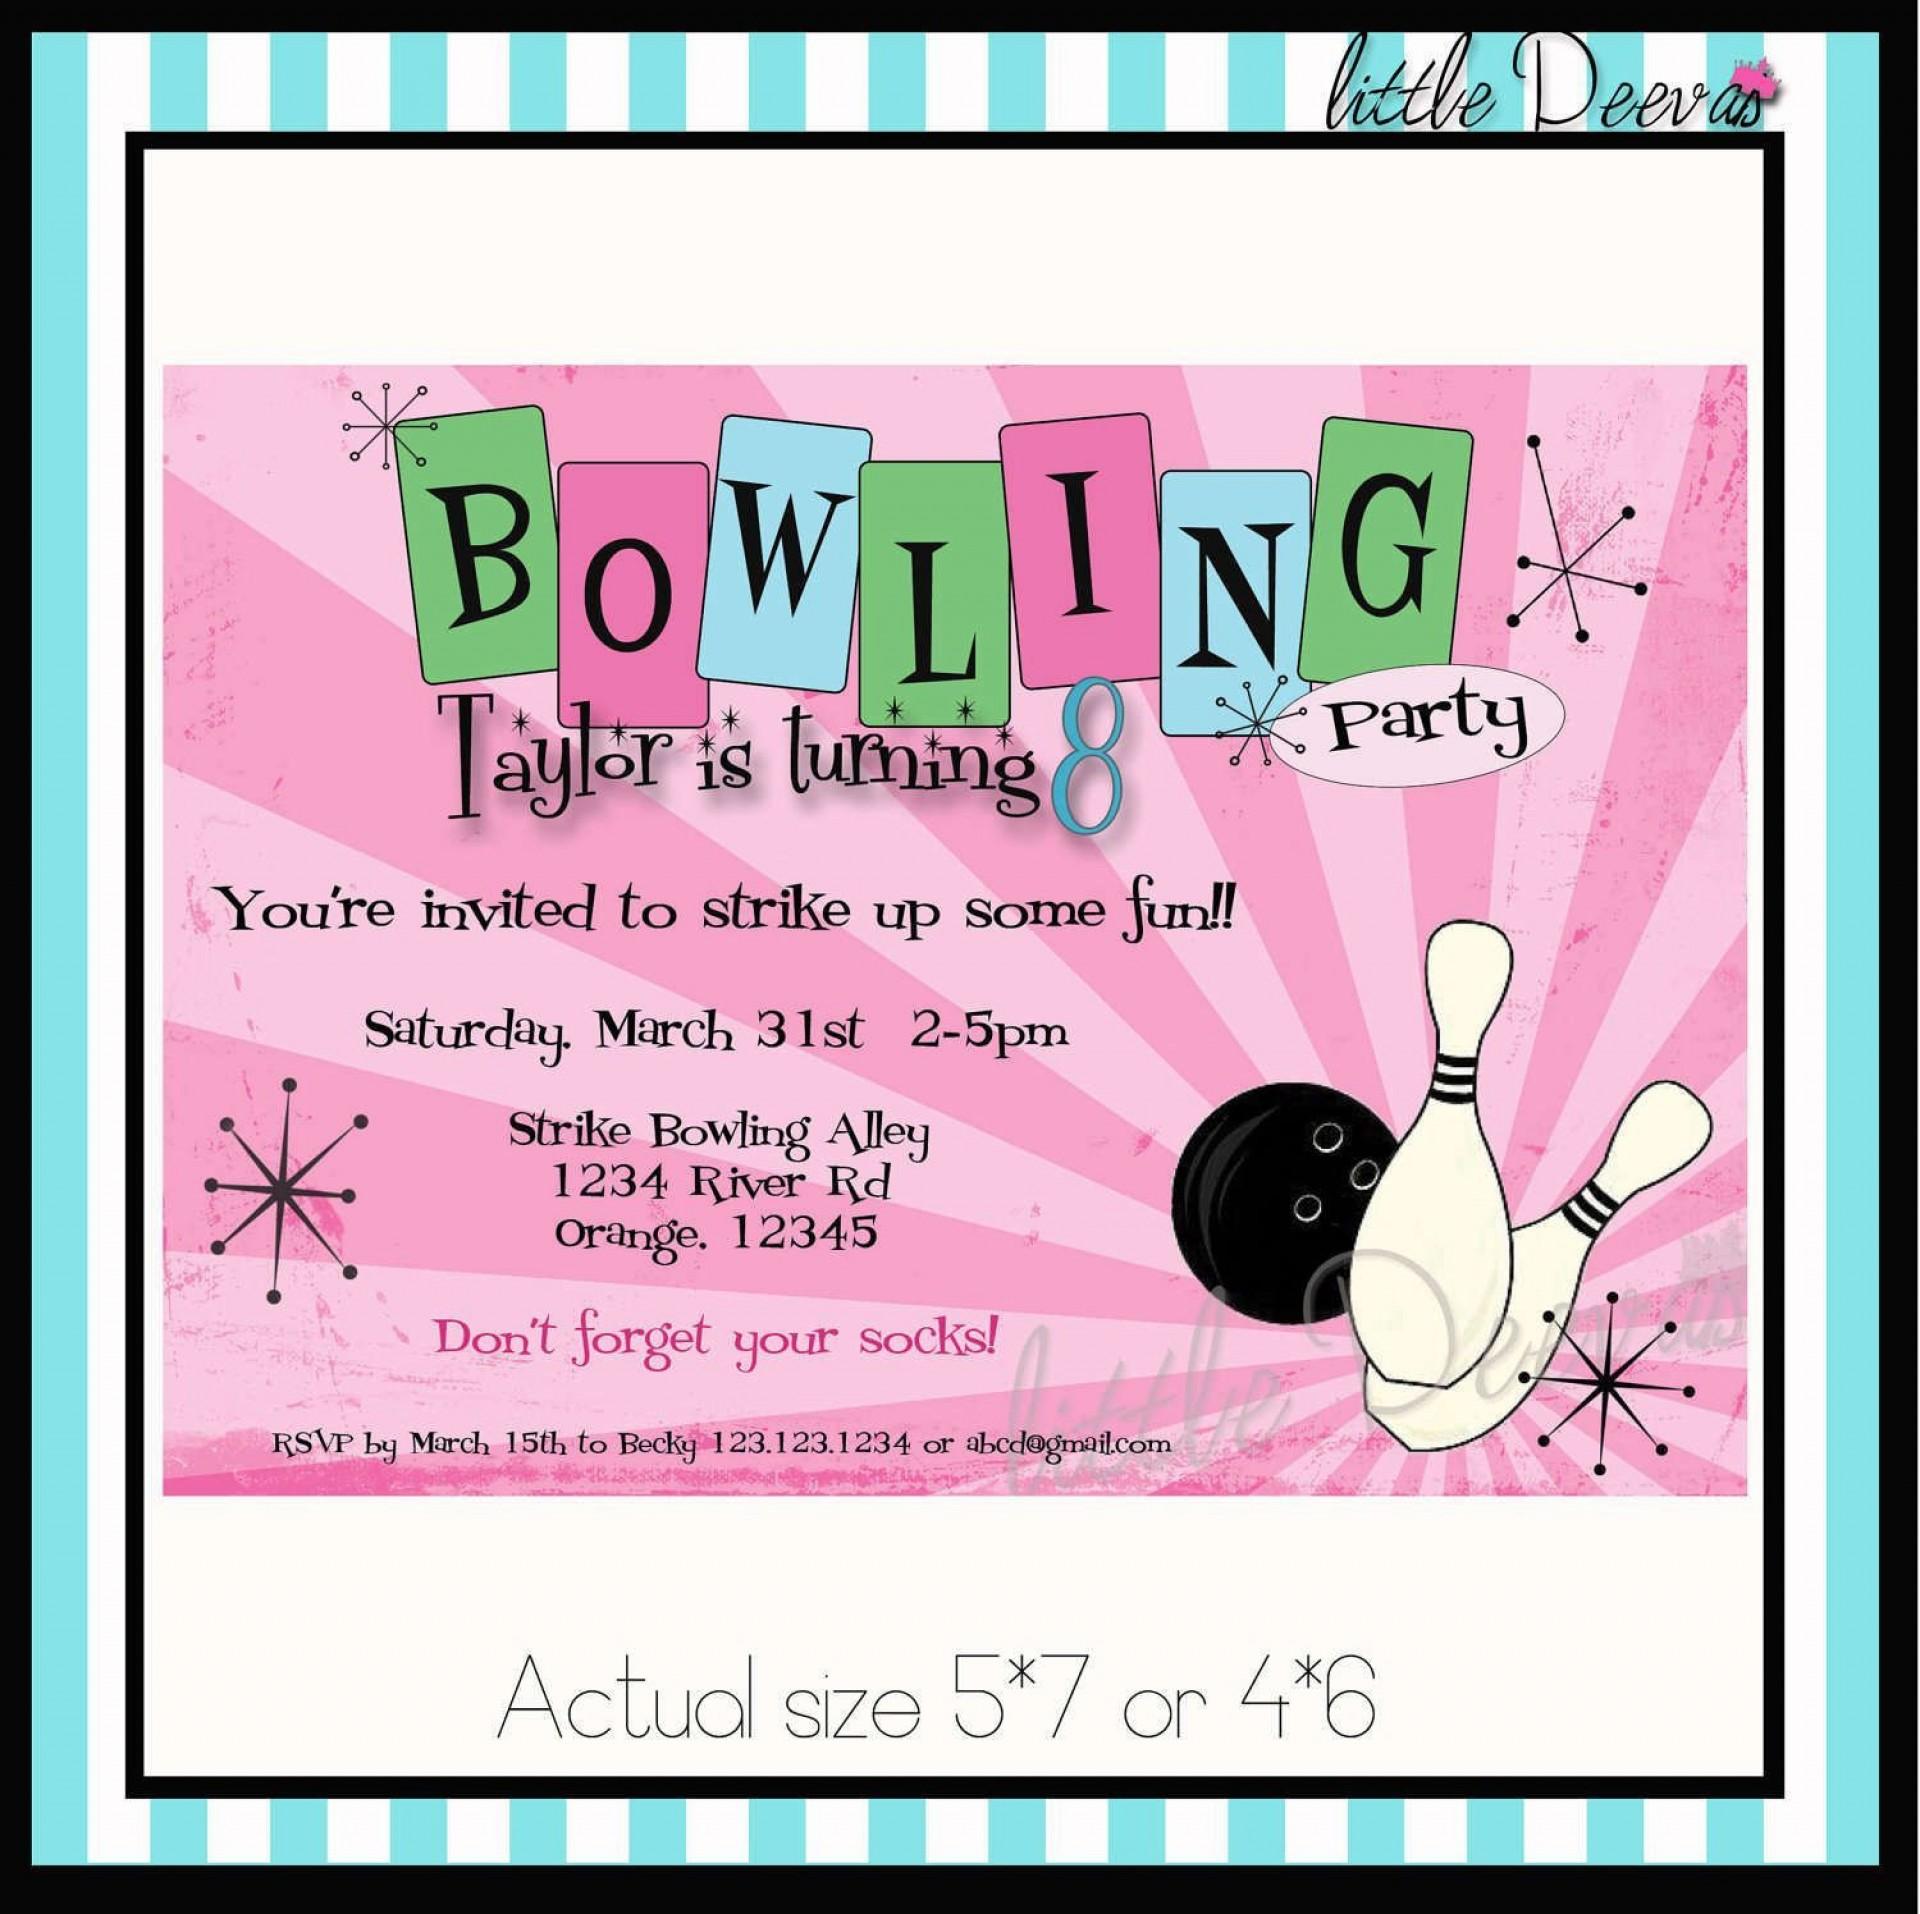 005 Impressive Bowling Party Invite Printable Free Example  Birthday Invitation1920